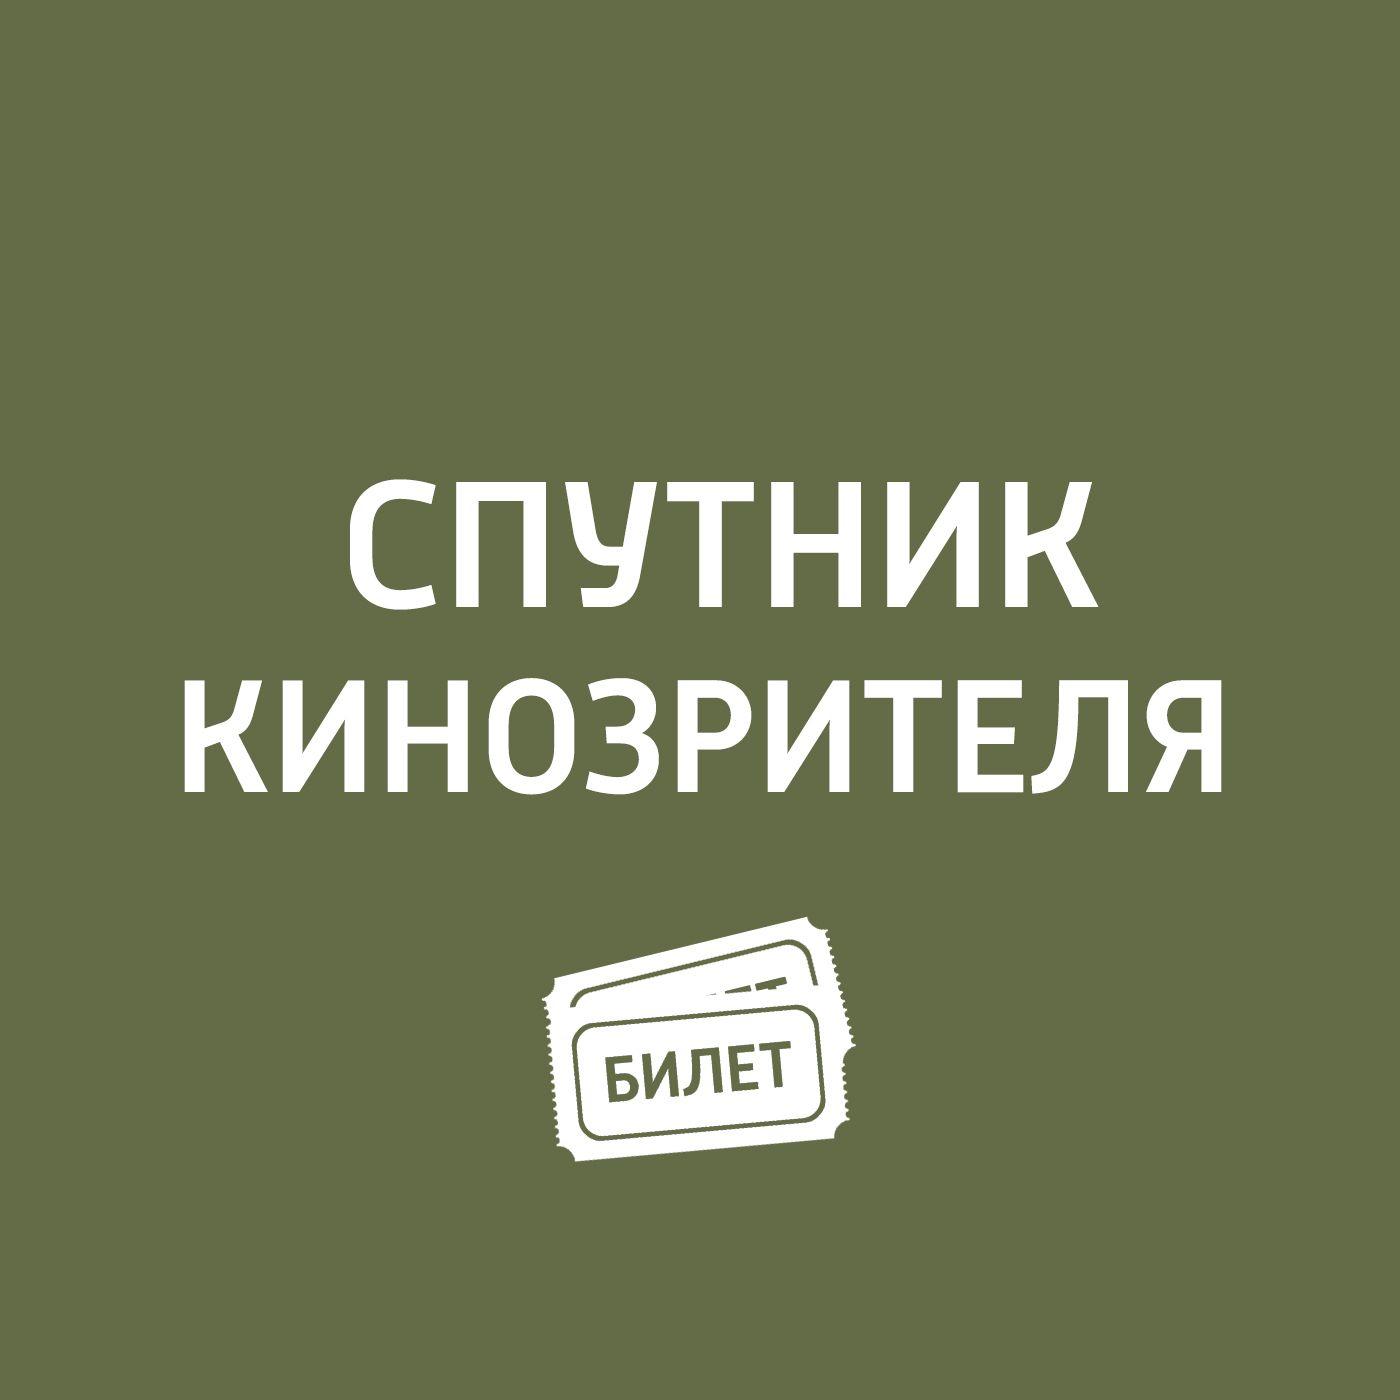 Антон Долин Наркокурьер, Любовницы, Юморист елена калкан личный код счастливого замужества